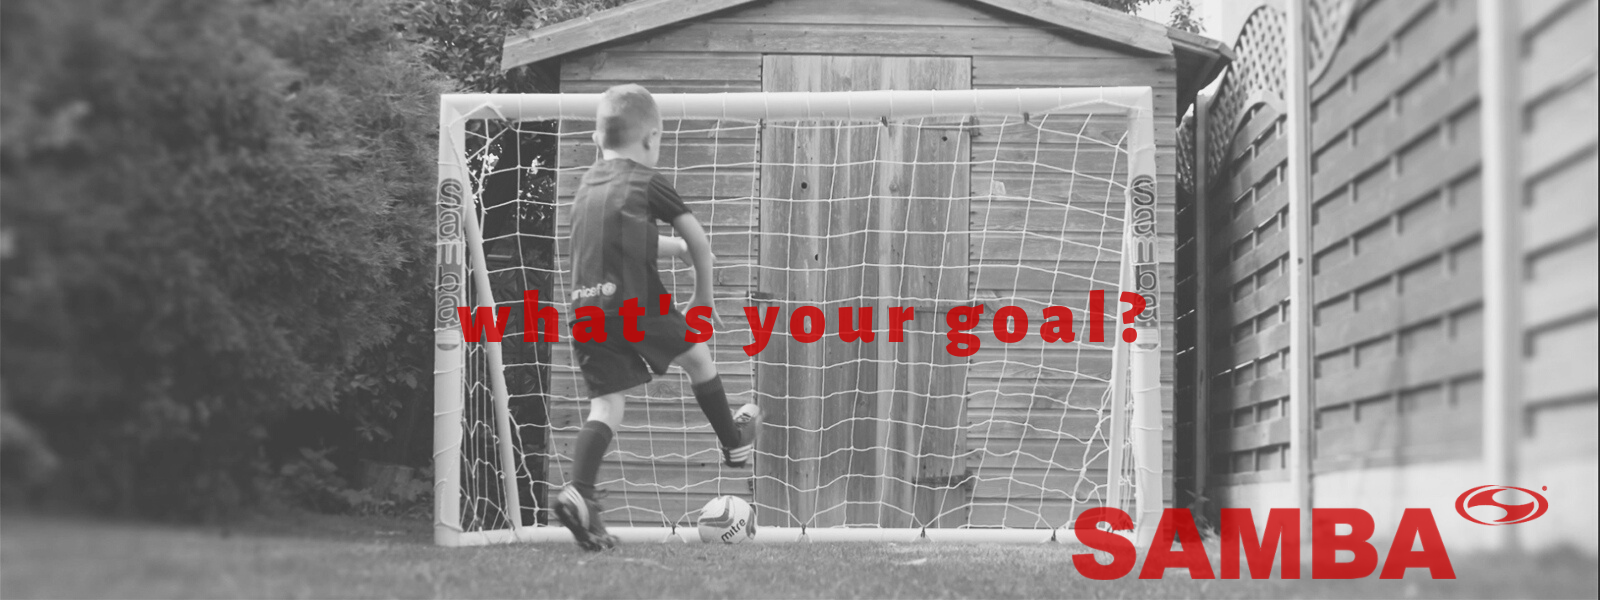 Samba - whats your goal video